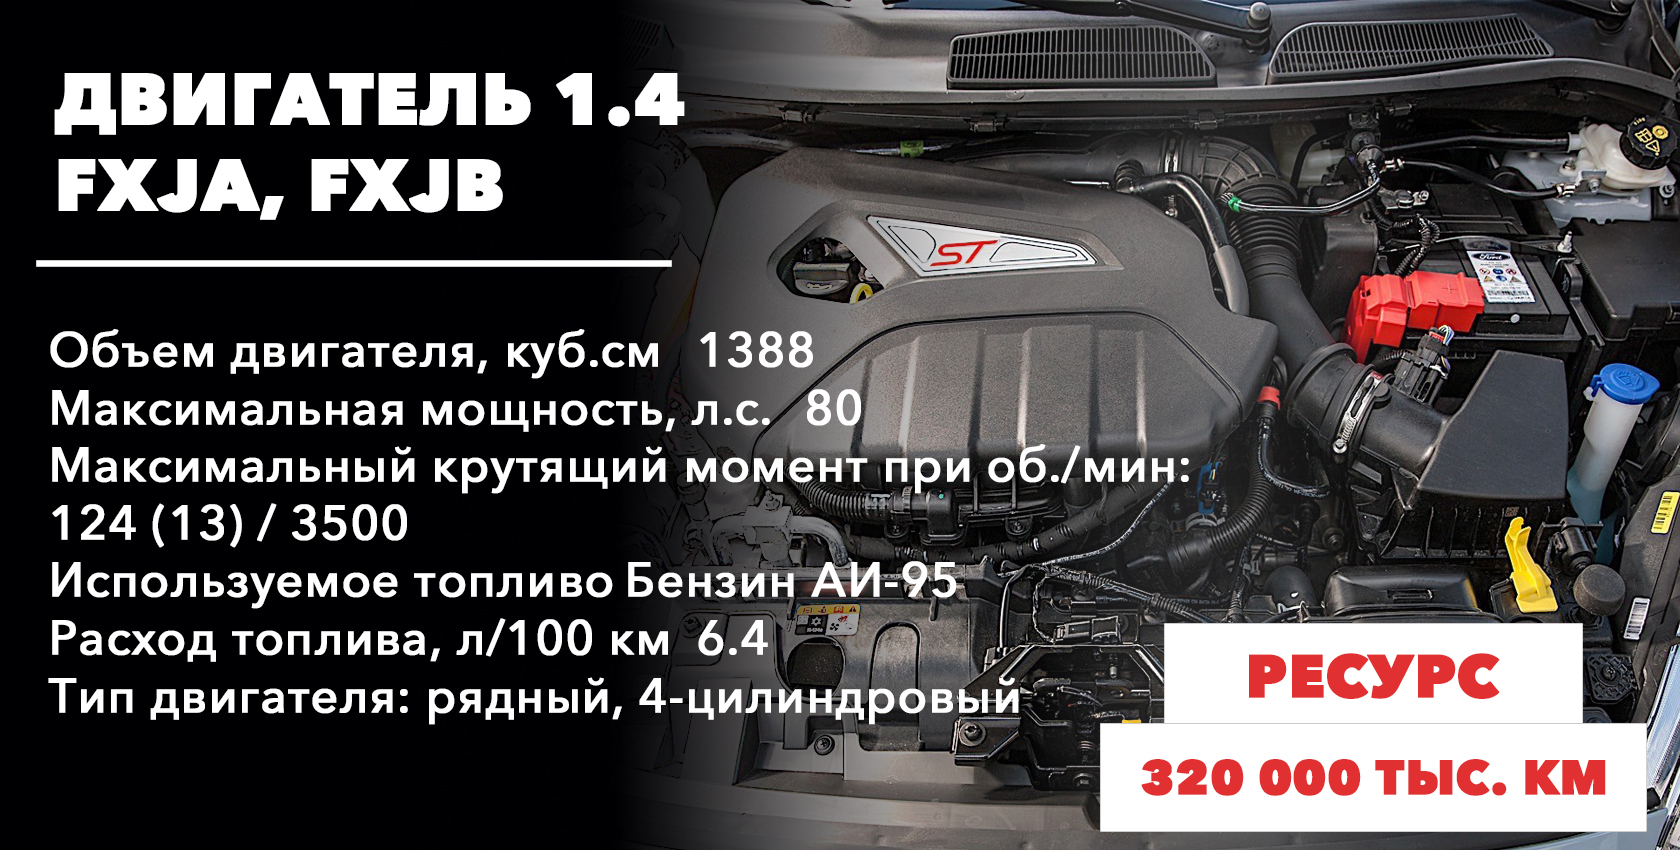 Ресурс двигателя Форд Фиеста 1.4